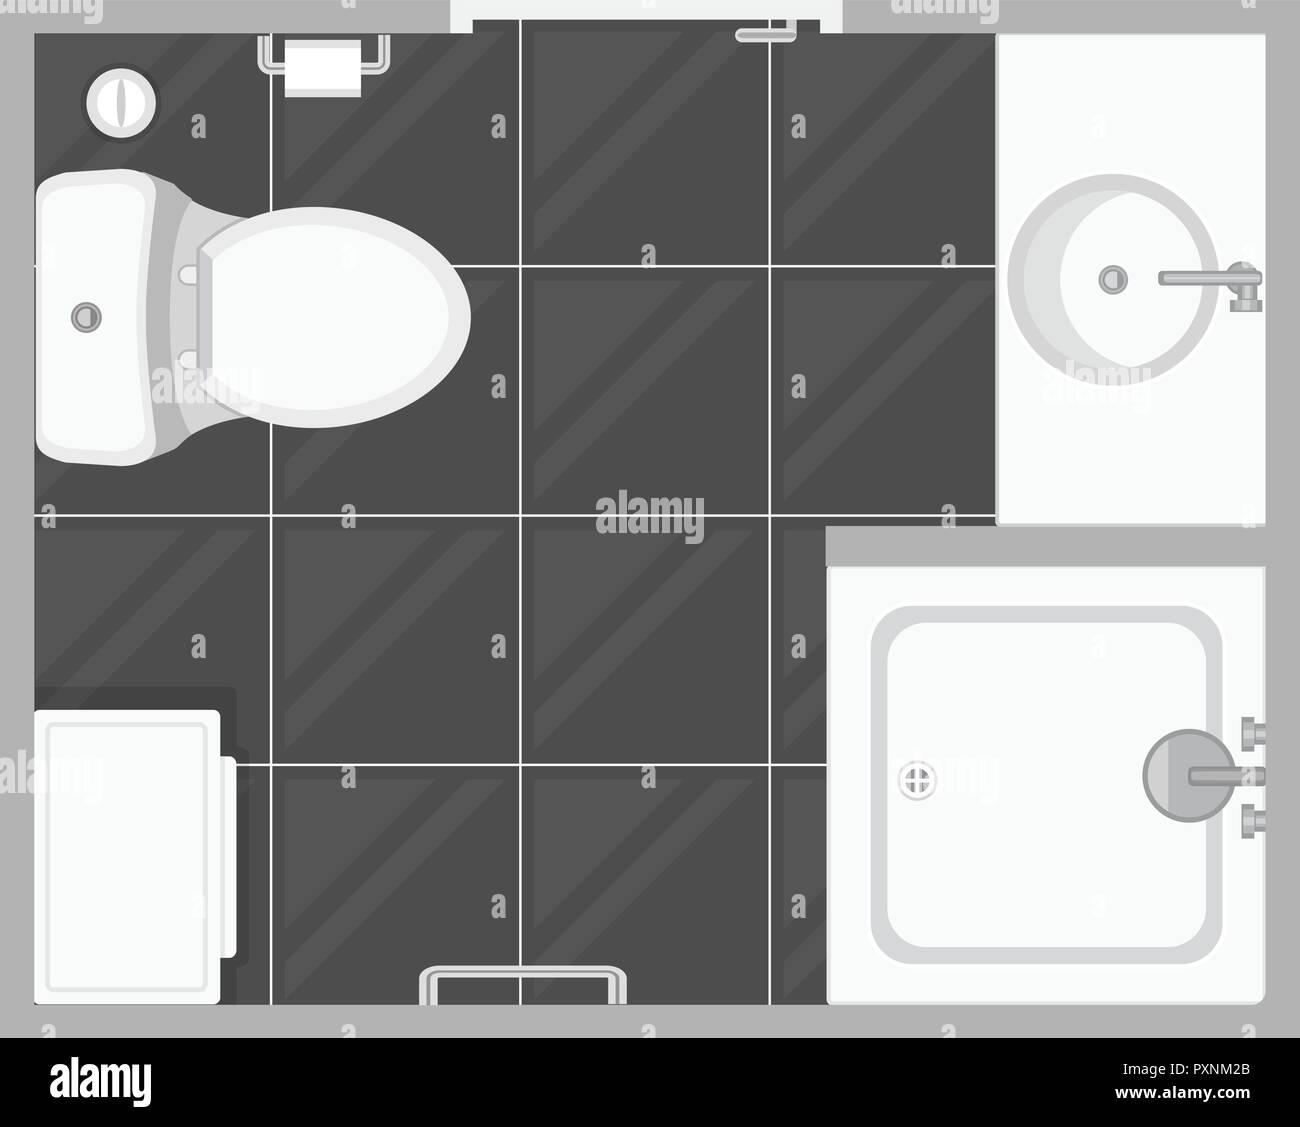 Bathroom Interior Top View Vector Illustration Floor Plan Of Toilet